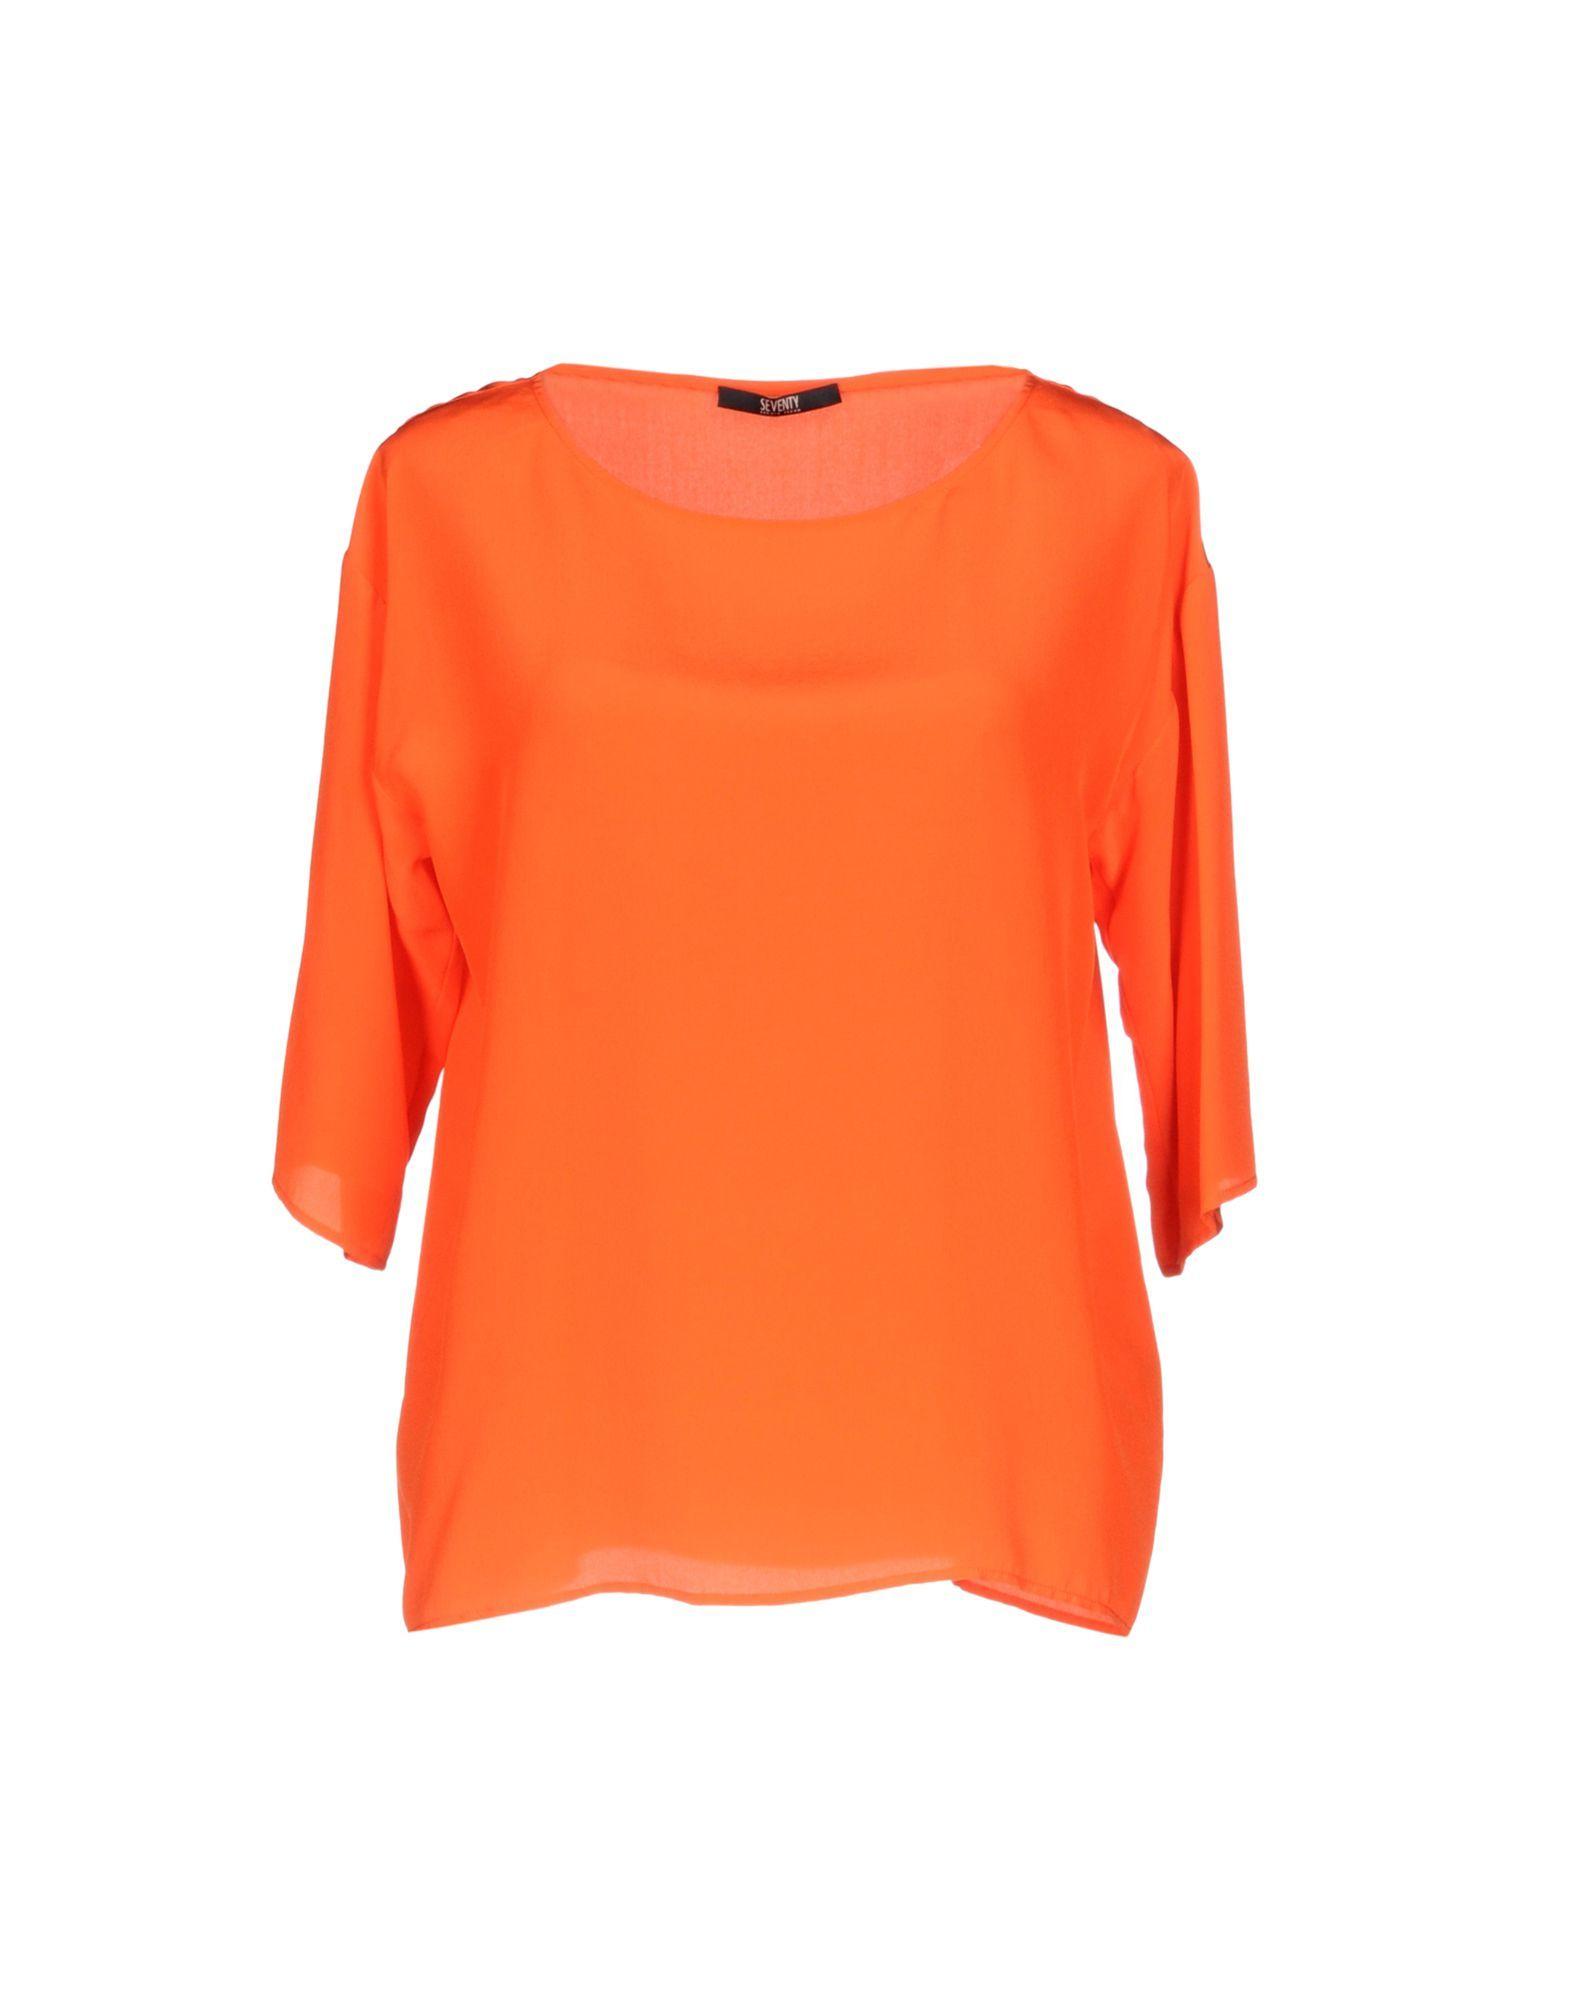 SHIRTS Seventy Sergio Tegon Orange Woman Silk